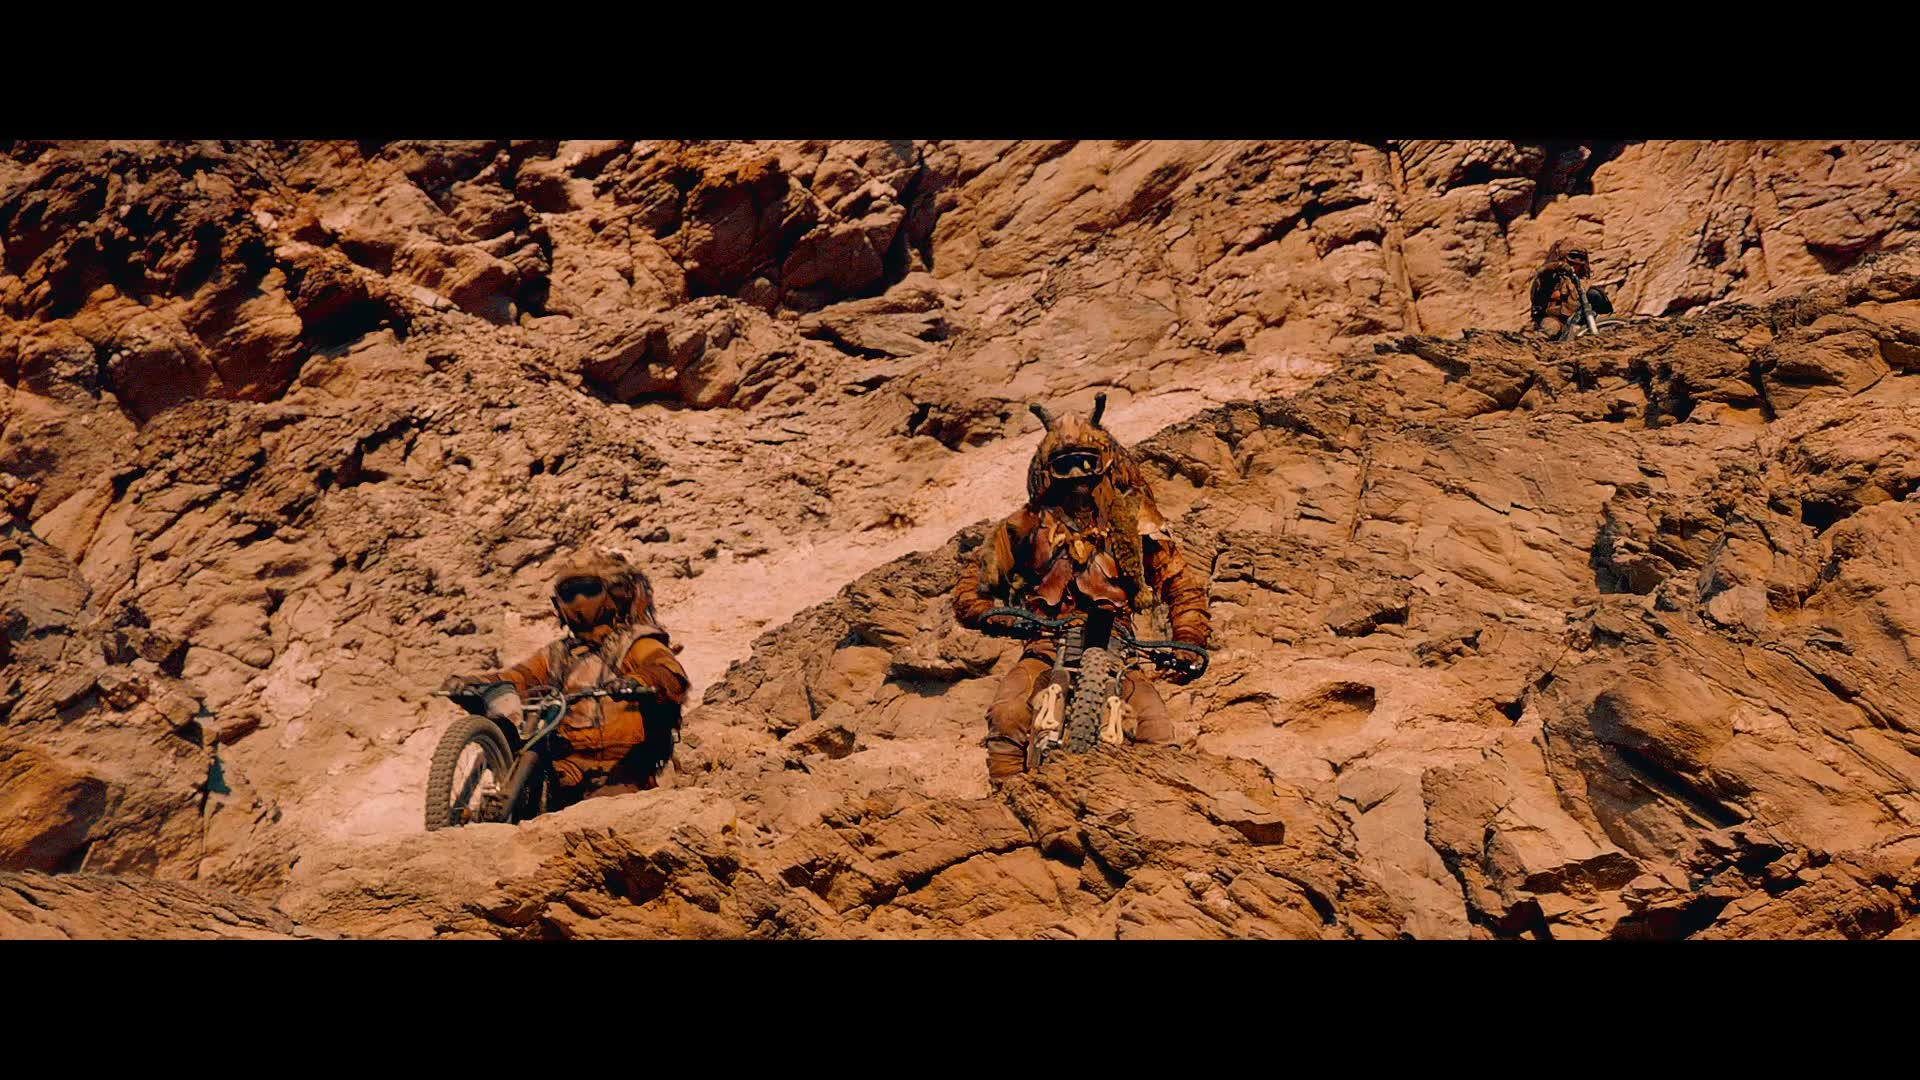 Mad Max: Fury Road full movie free download